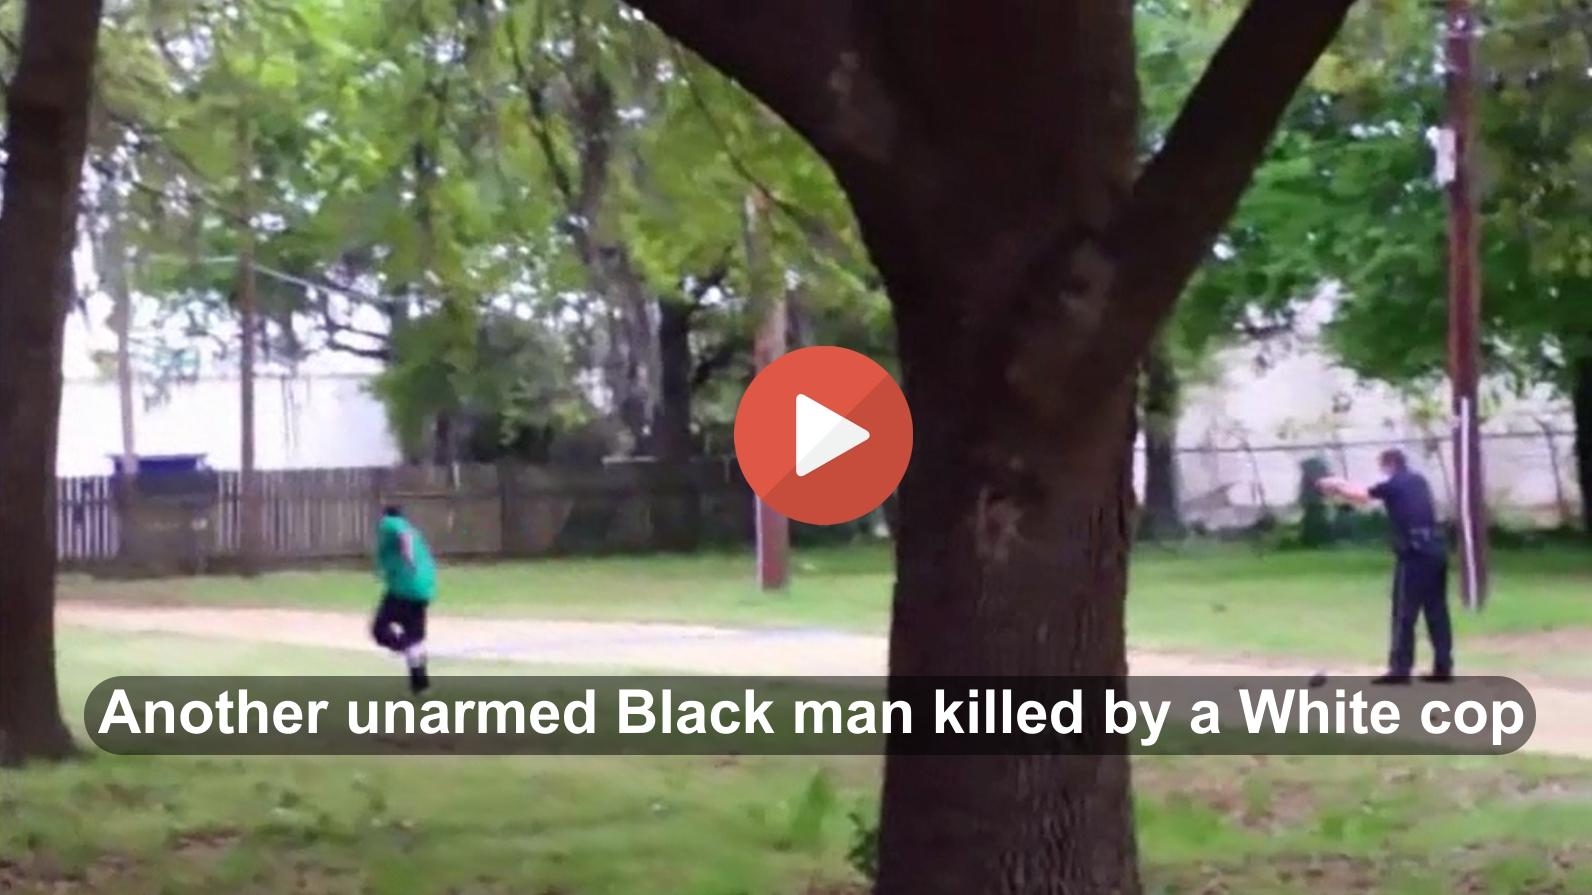 White South Carolina Police officer kills unarmed Black man Walter Scott